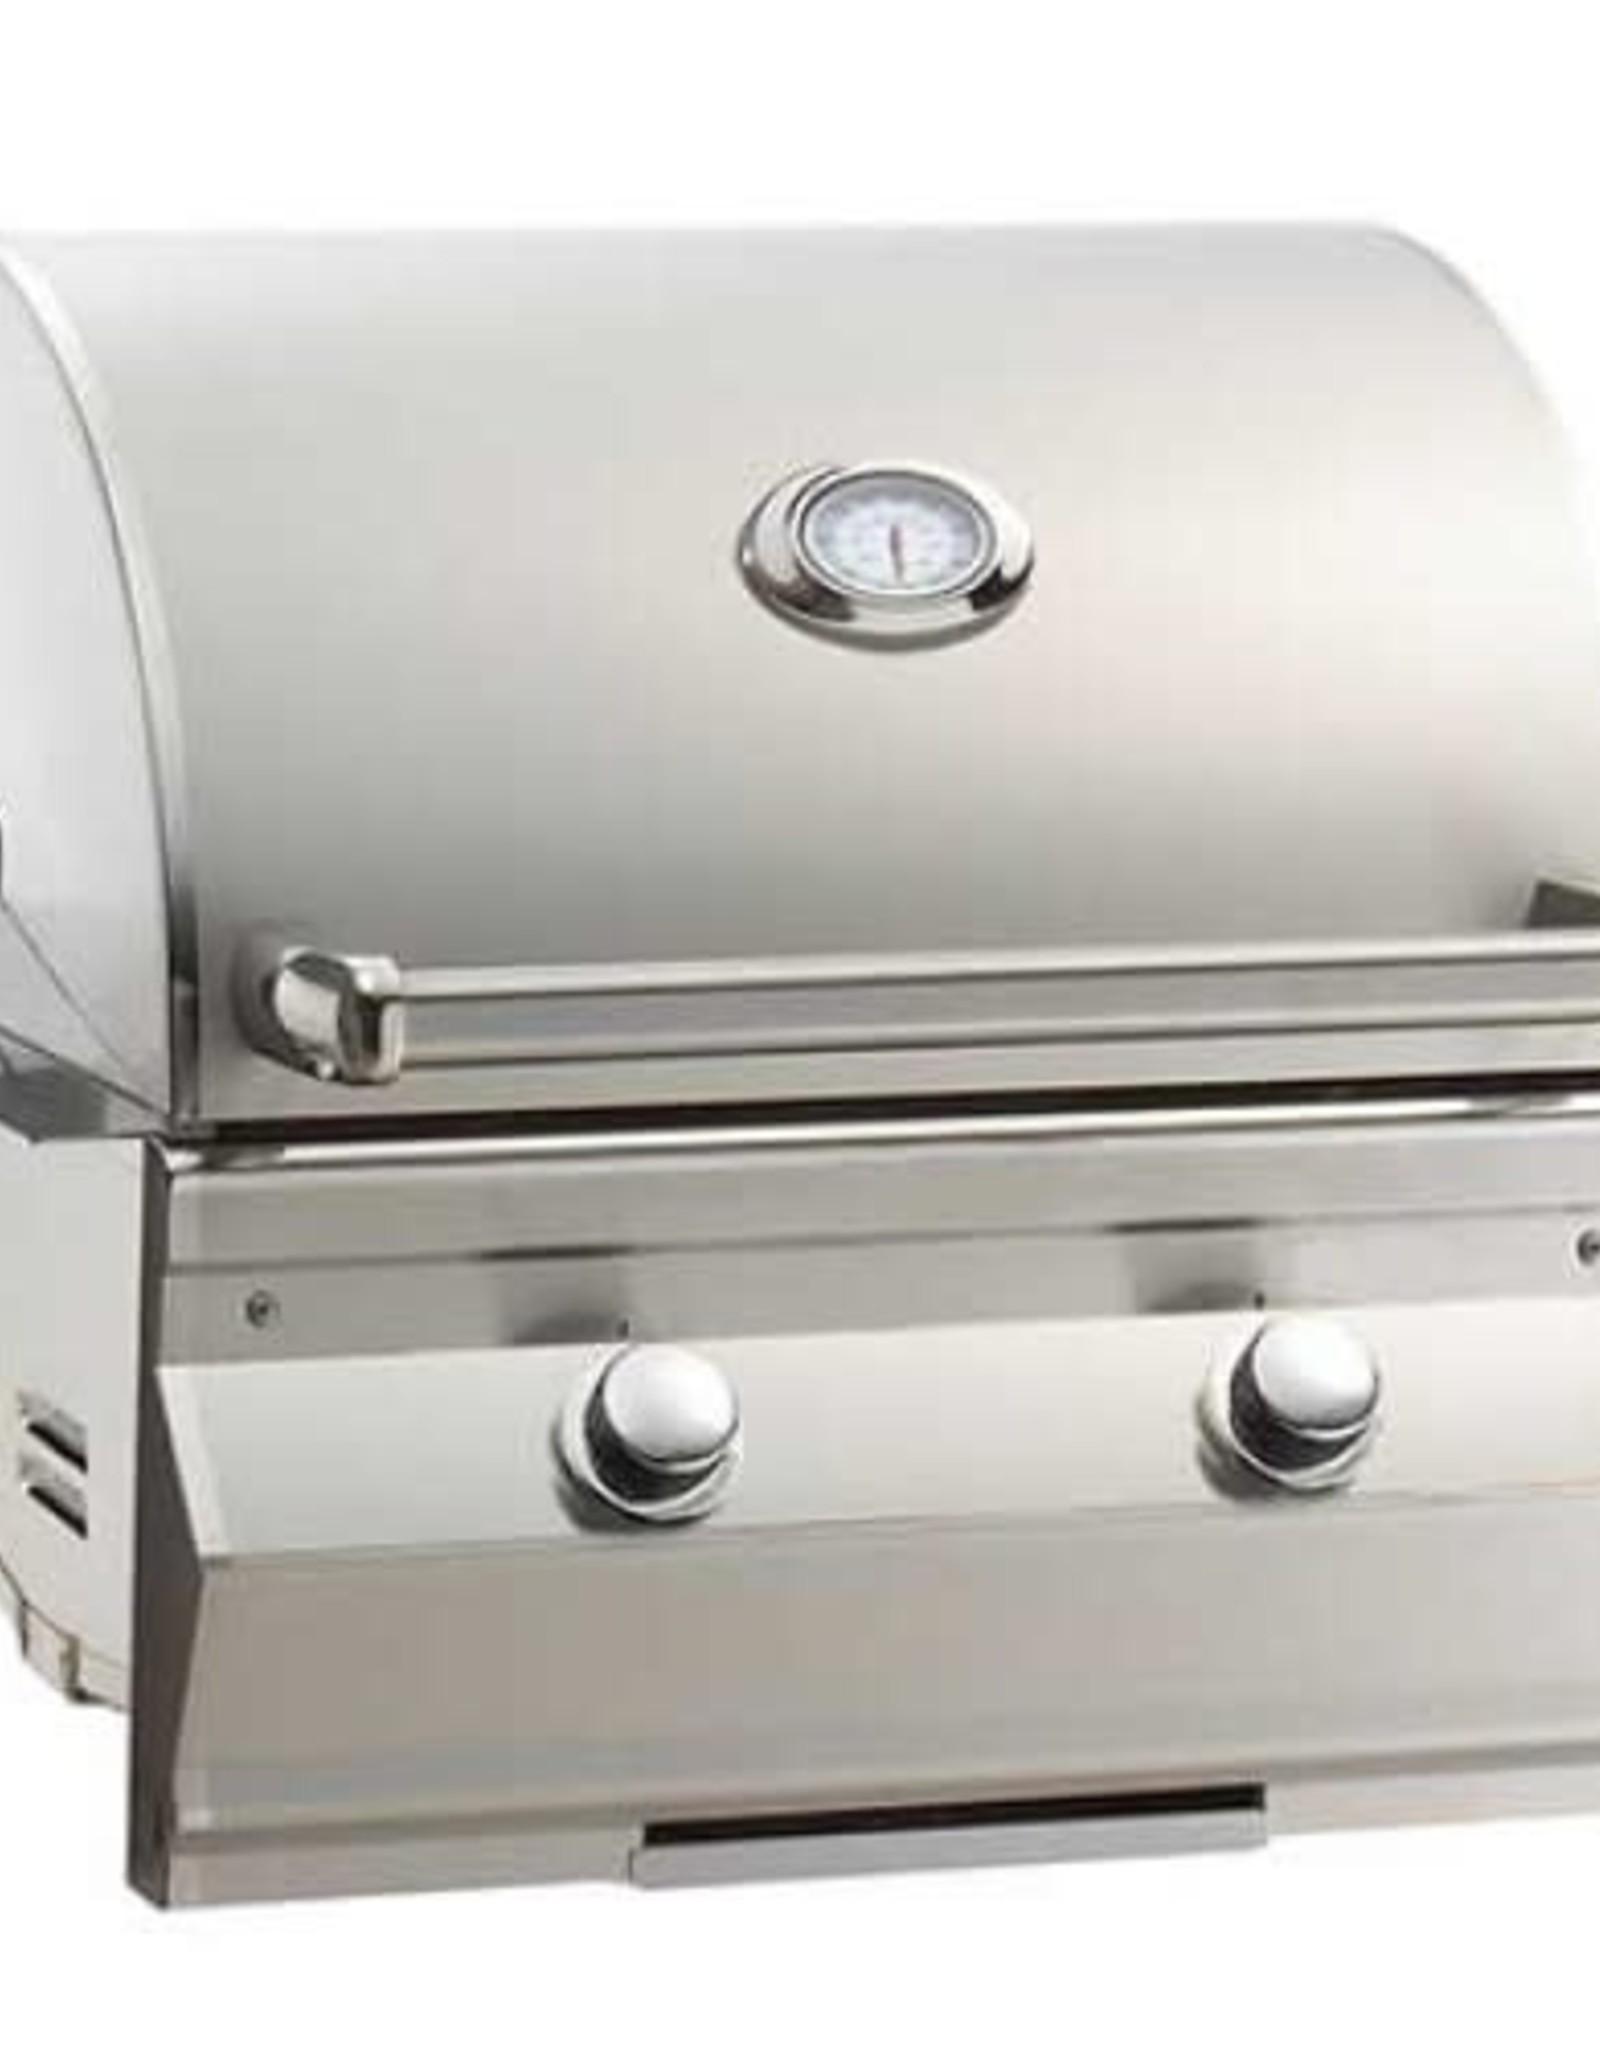 Fire Magic Fire Magic - Choice C430i 24-inch Built-In Grill